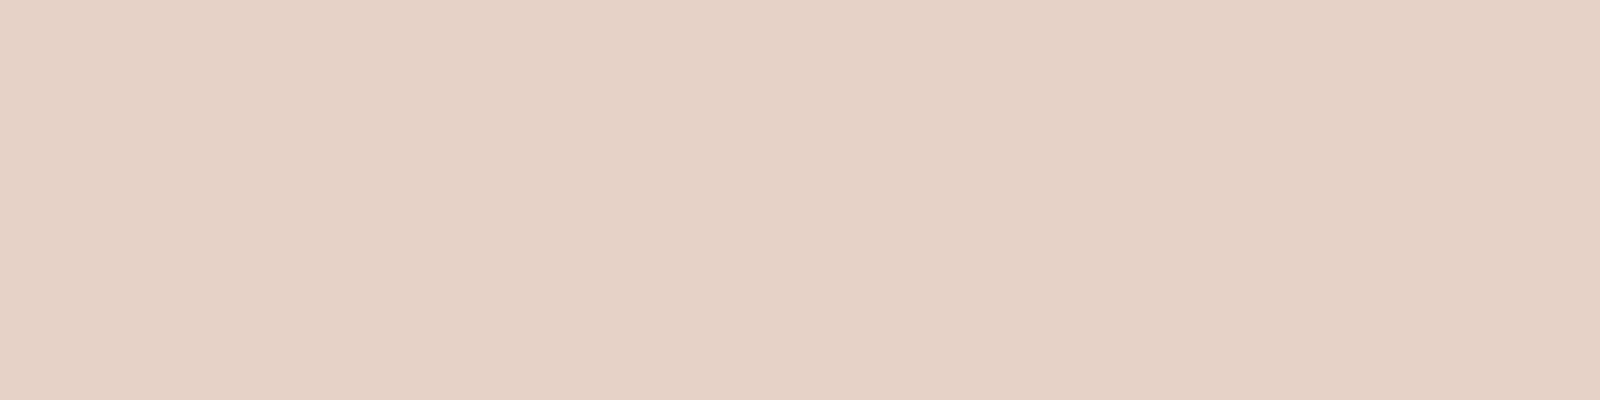 794 Almond Gutter Color